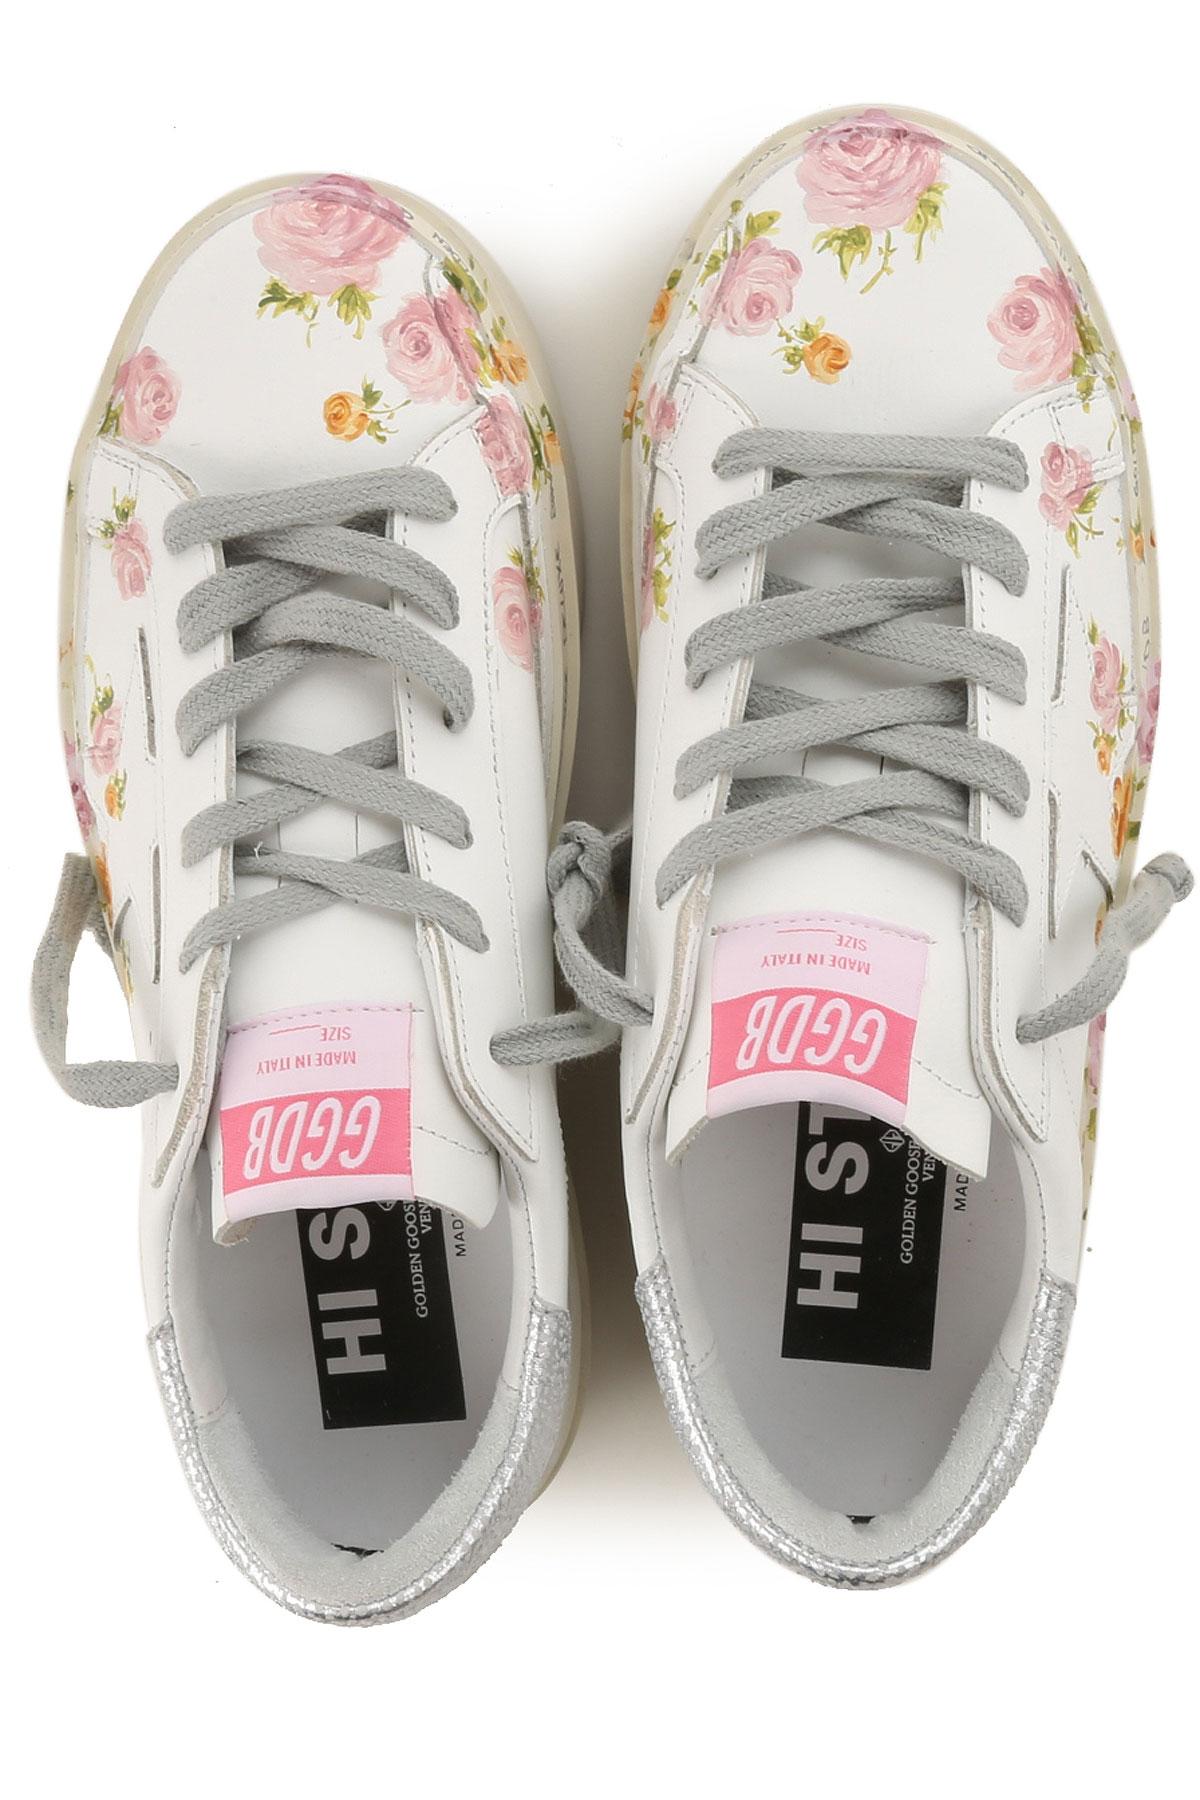 verano Zapatos Blanco Rosa nbsp;plata Primavera Golden Mujer Goose Para 2019 ZXHUvq5